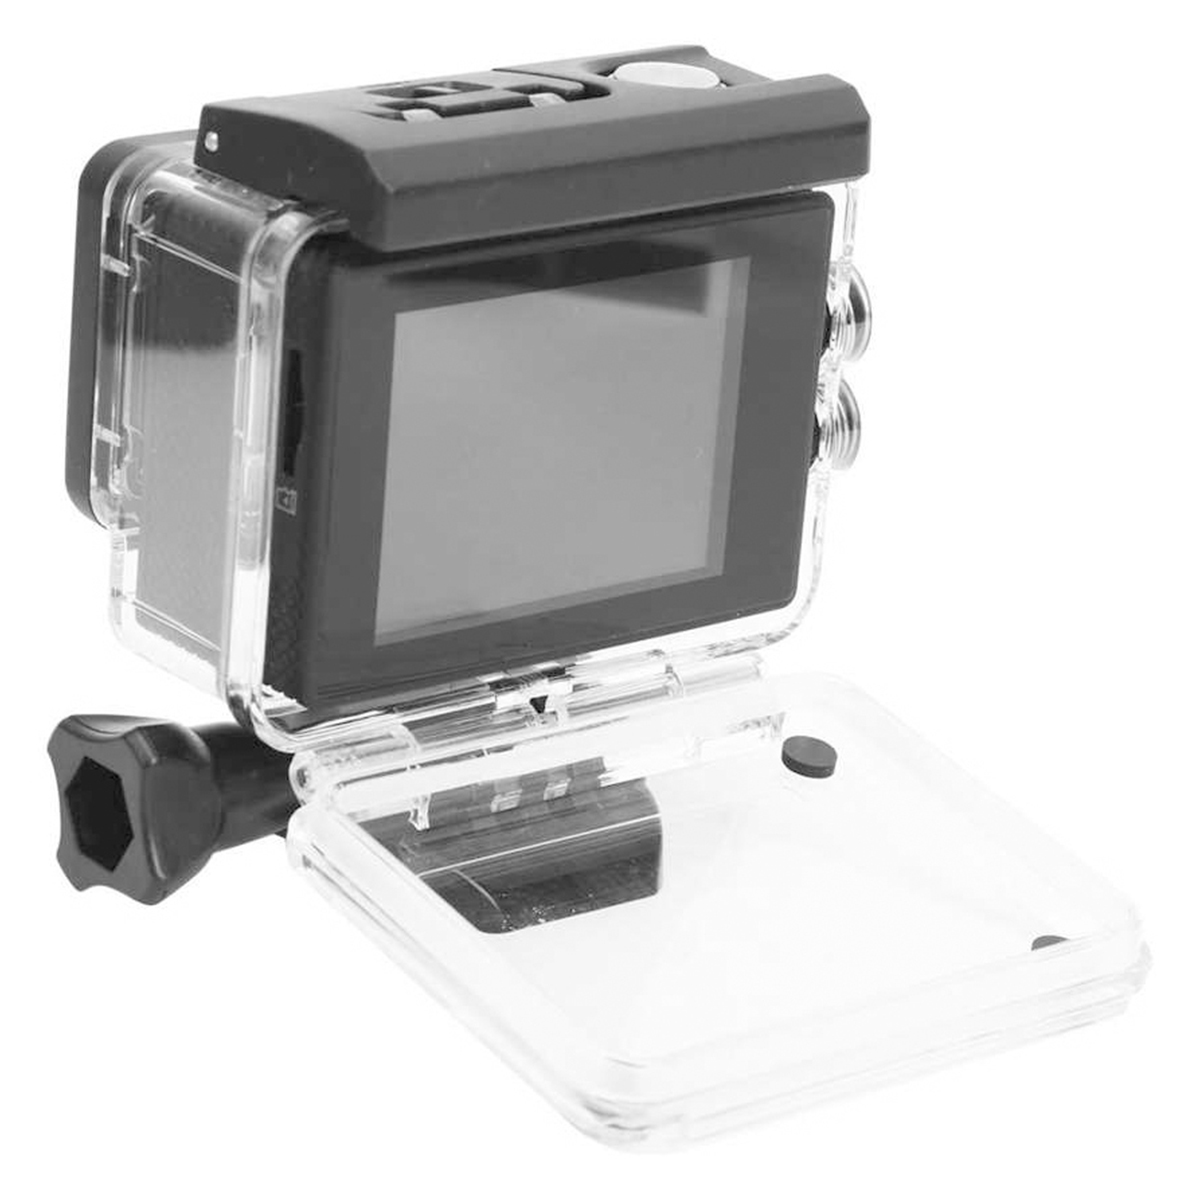 Camera Esportiva - Sjcam Sj4000 Wifi - 12 Mp